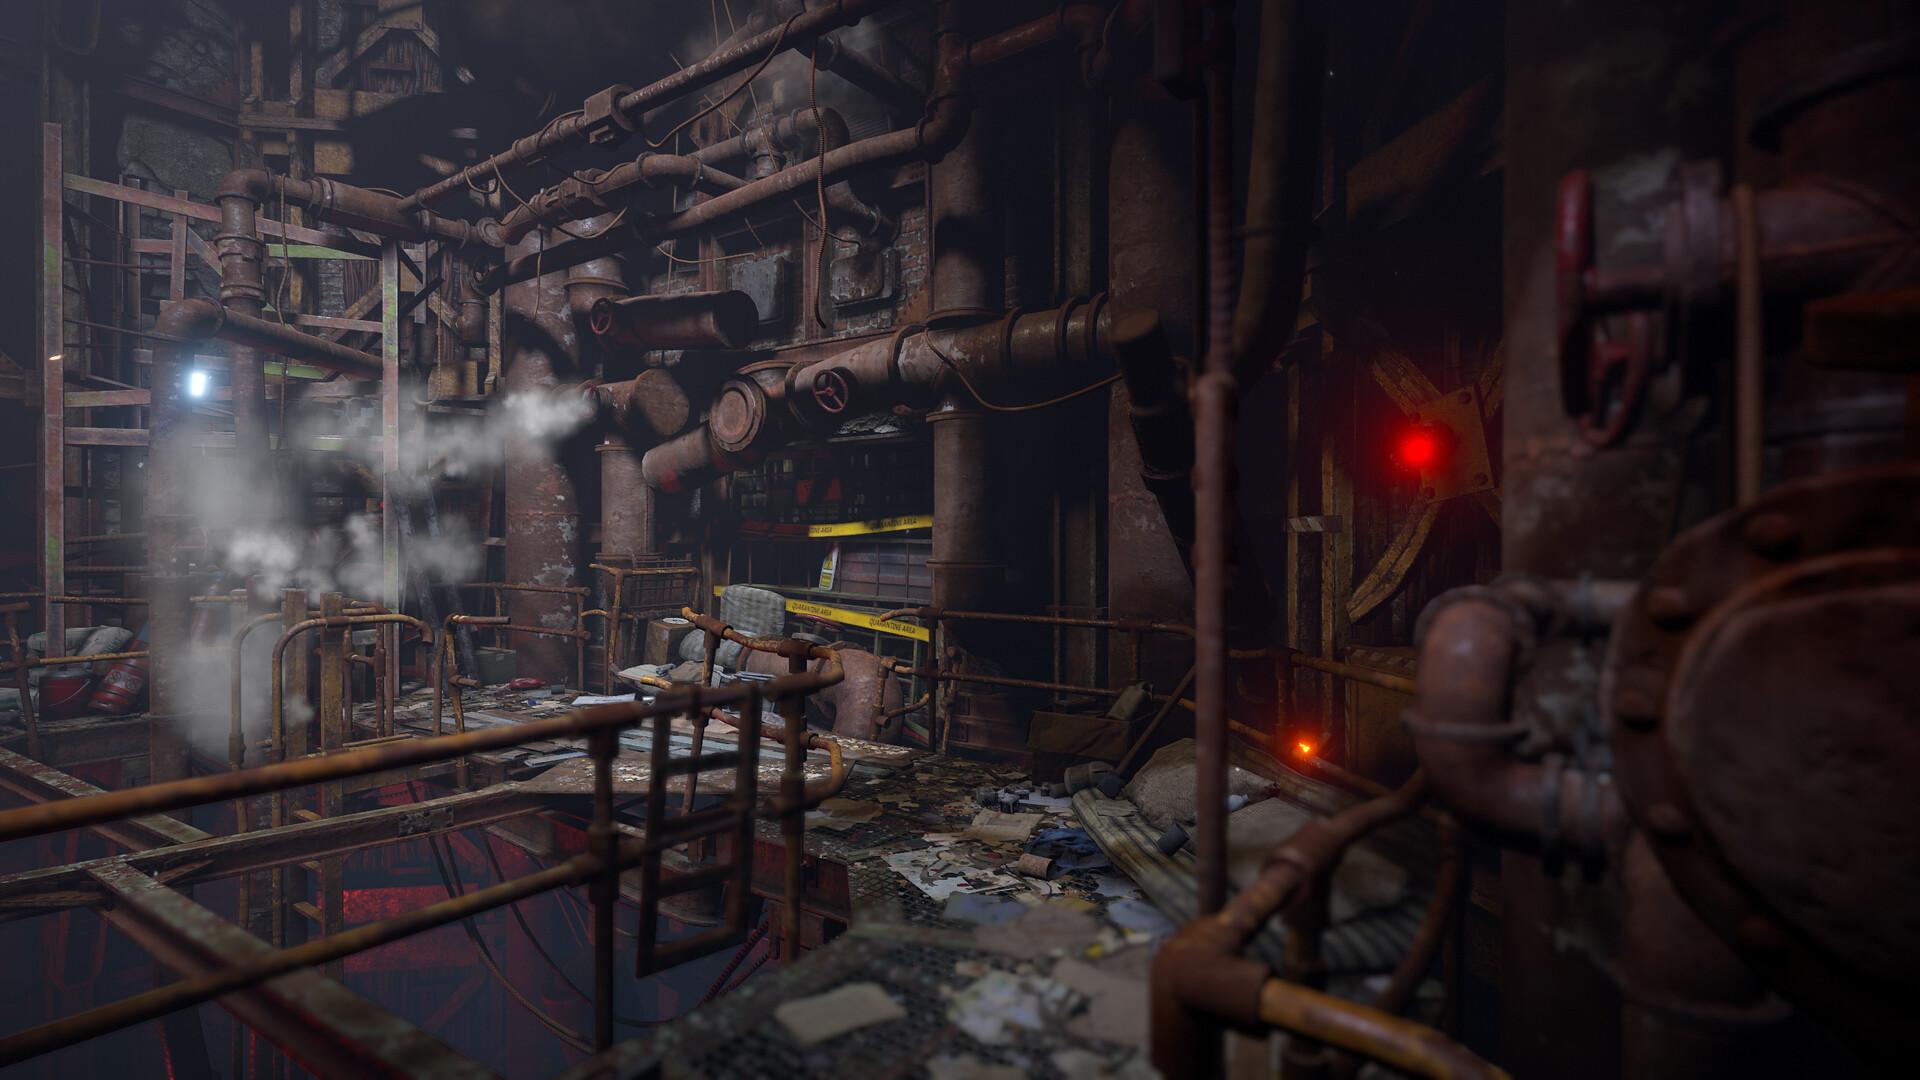 Andrew averkin utopiasyndrome boiler a2 07